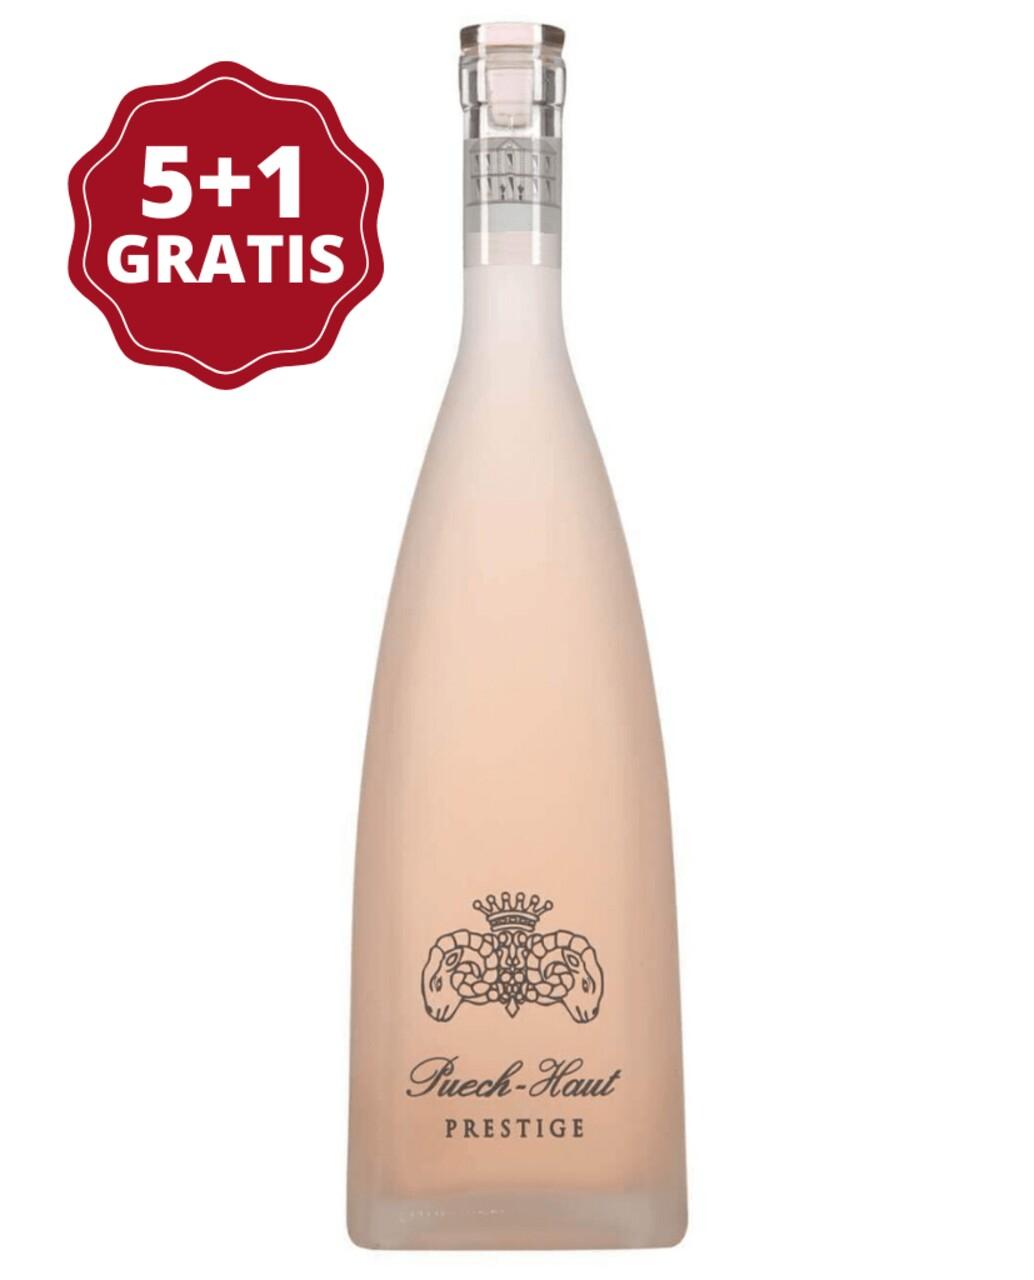 Copy of Chateau Puech Haut Prestige Rose Special Edition 5+1